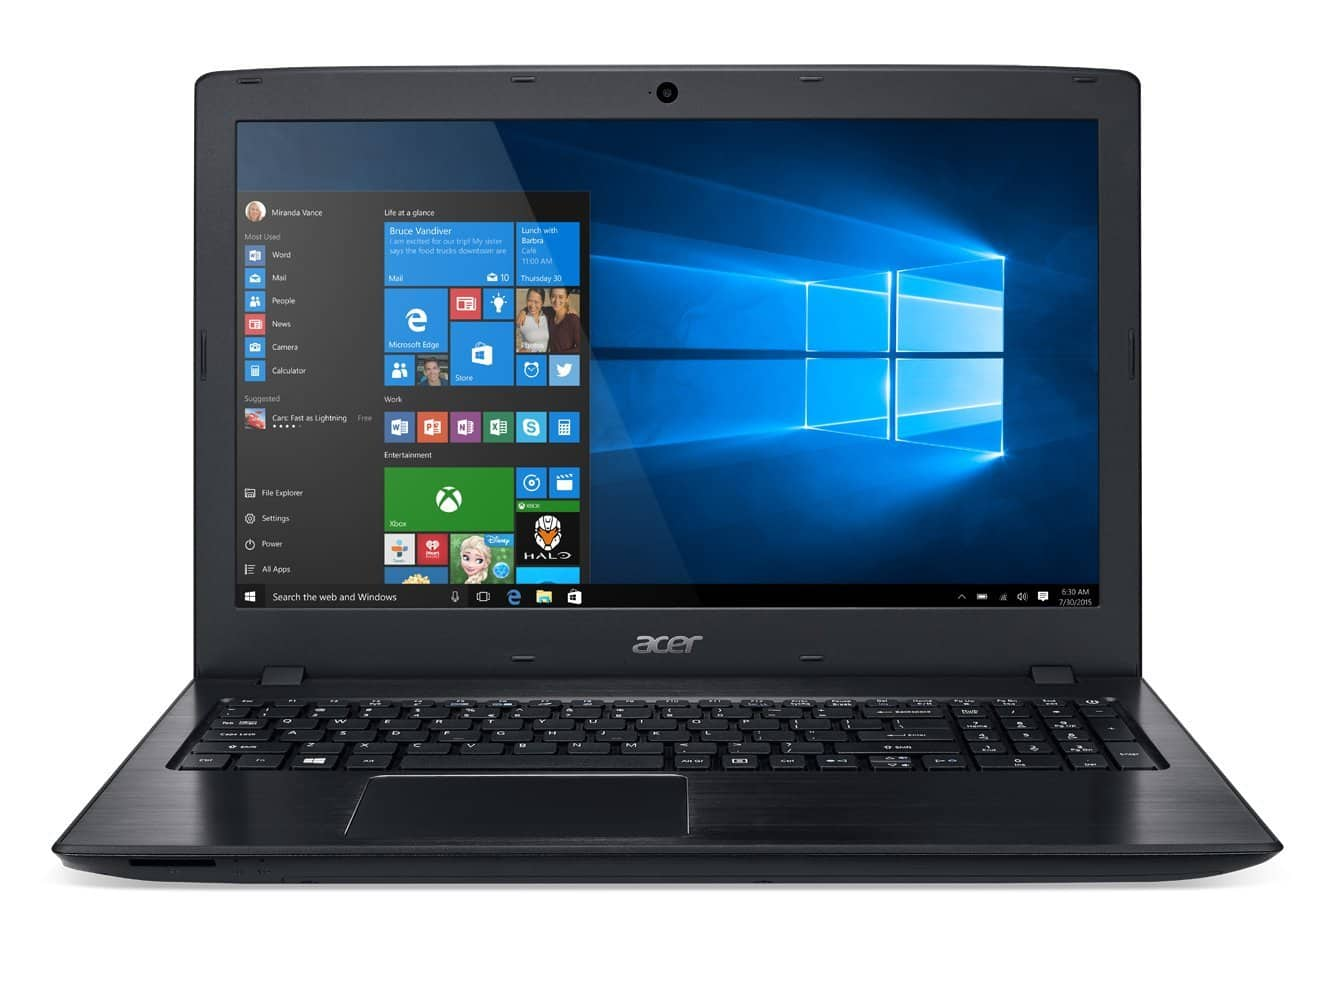 Acer Aspire E 15 E5-575G-53VG Laptop, 15.6 FHD   Core i5, NVIDIA 940MX, 8GB DDR4, 256GB SSD $499